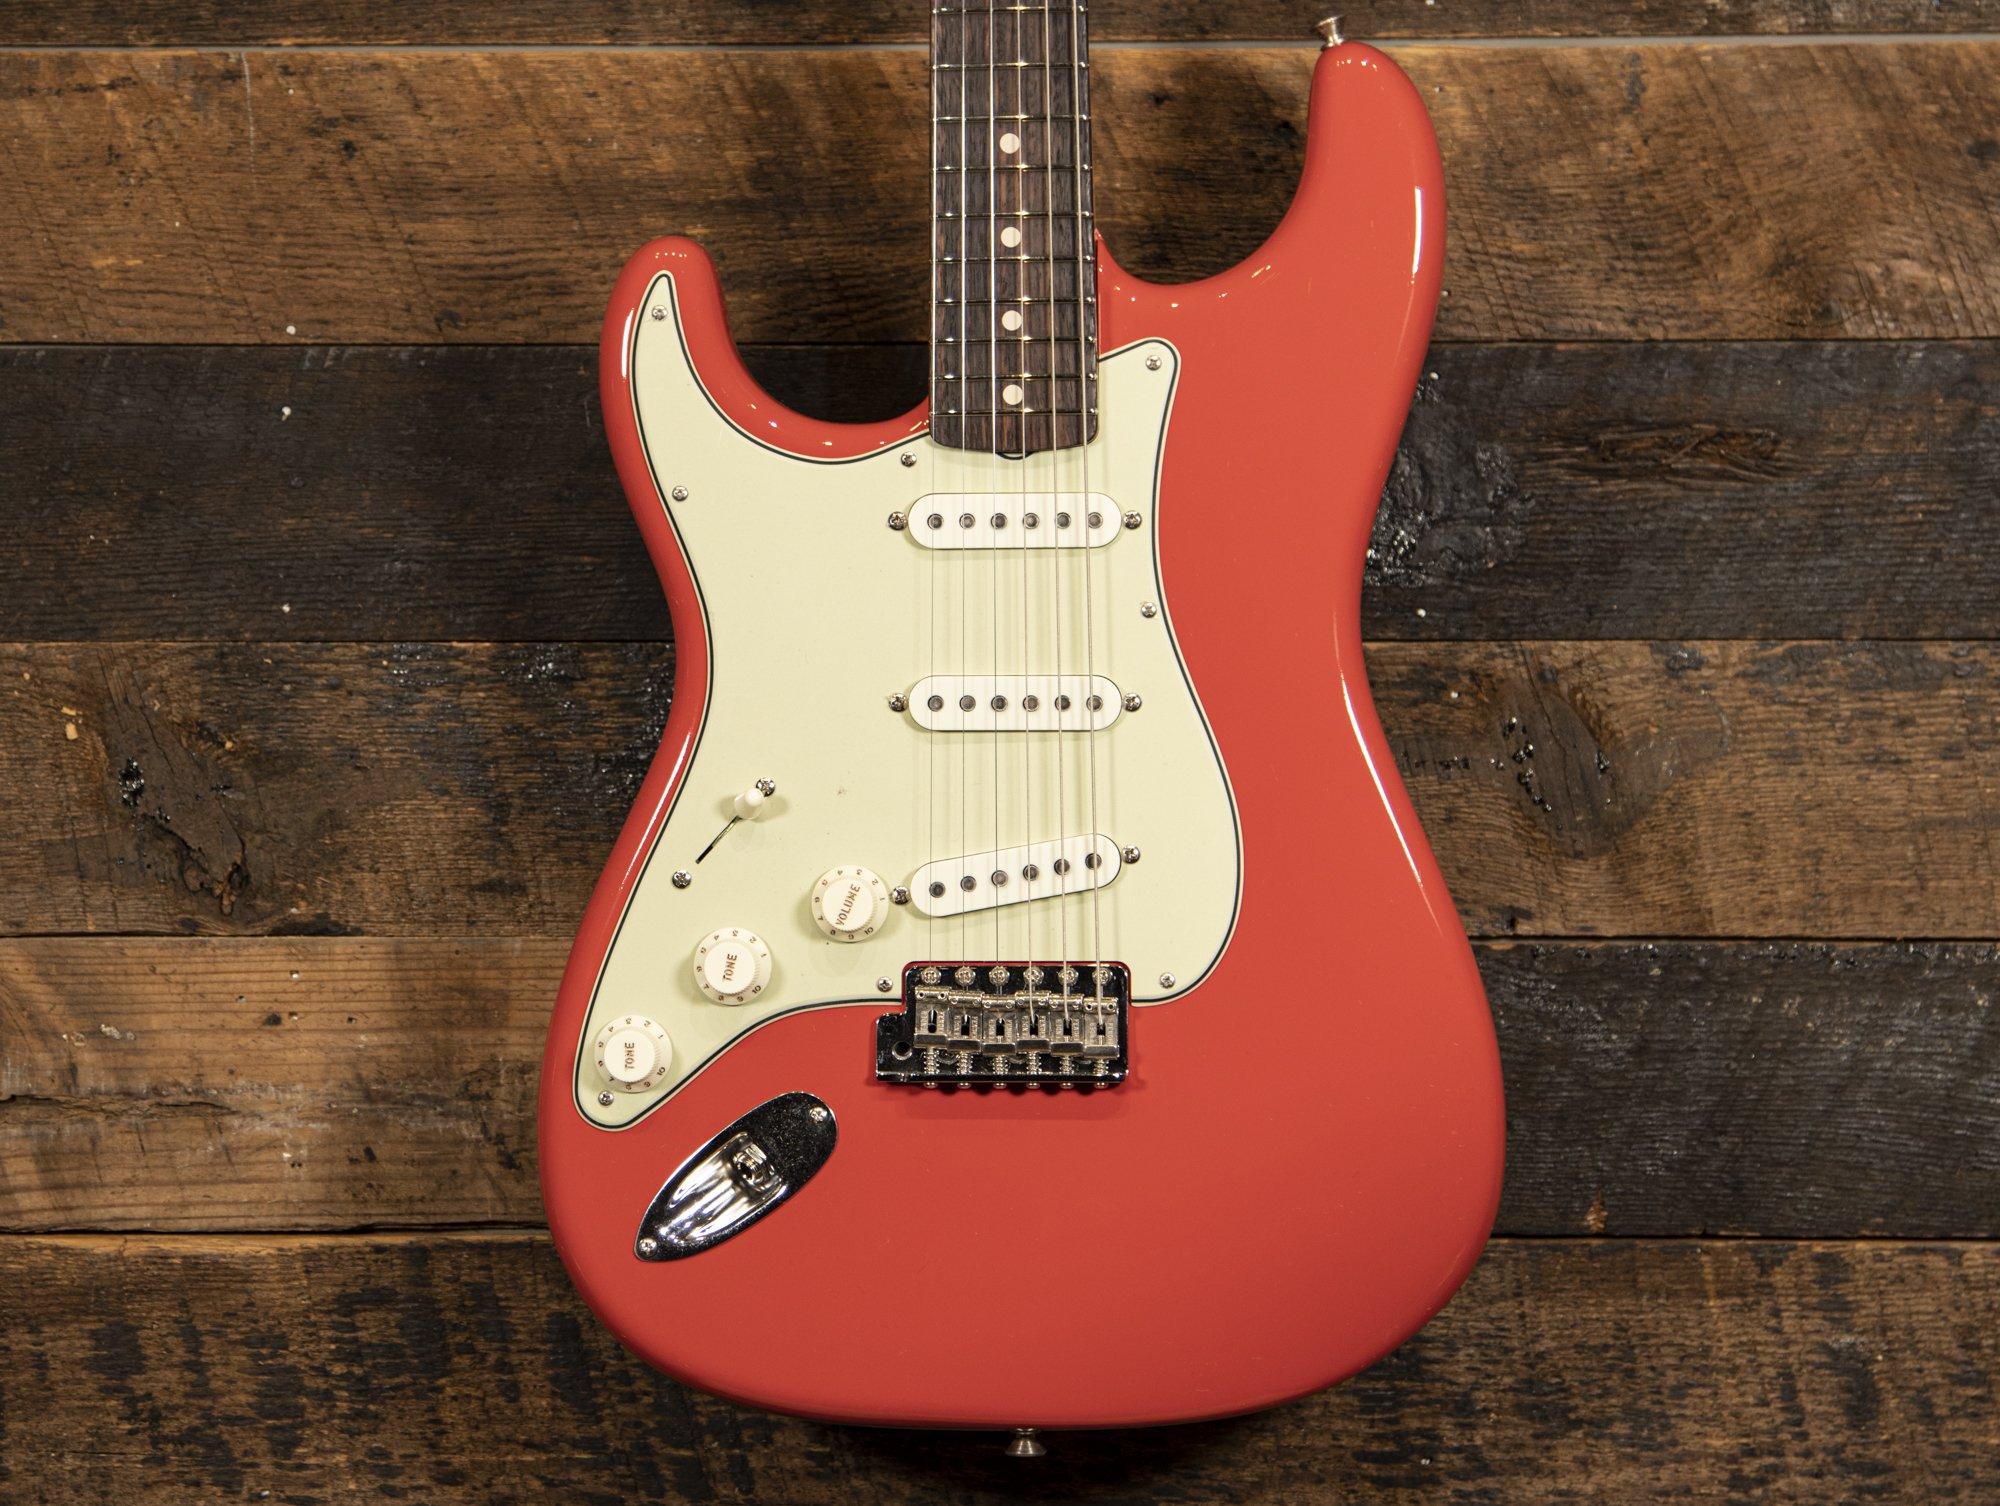 Left Handed Fender Custom Shop Fiesta Red (NOS Time Capsule)